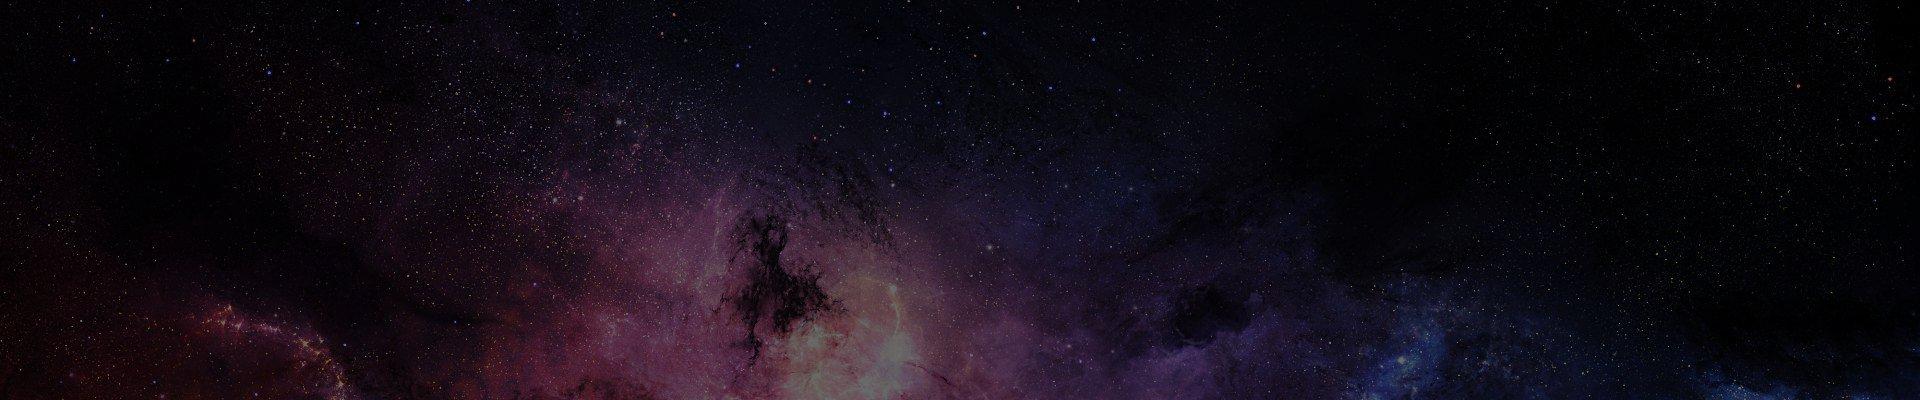 NYE 2019 slider background 1920×400 3